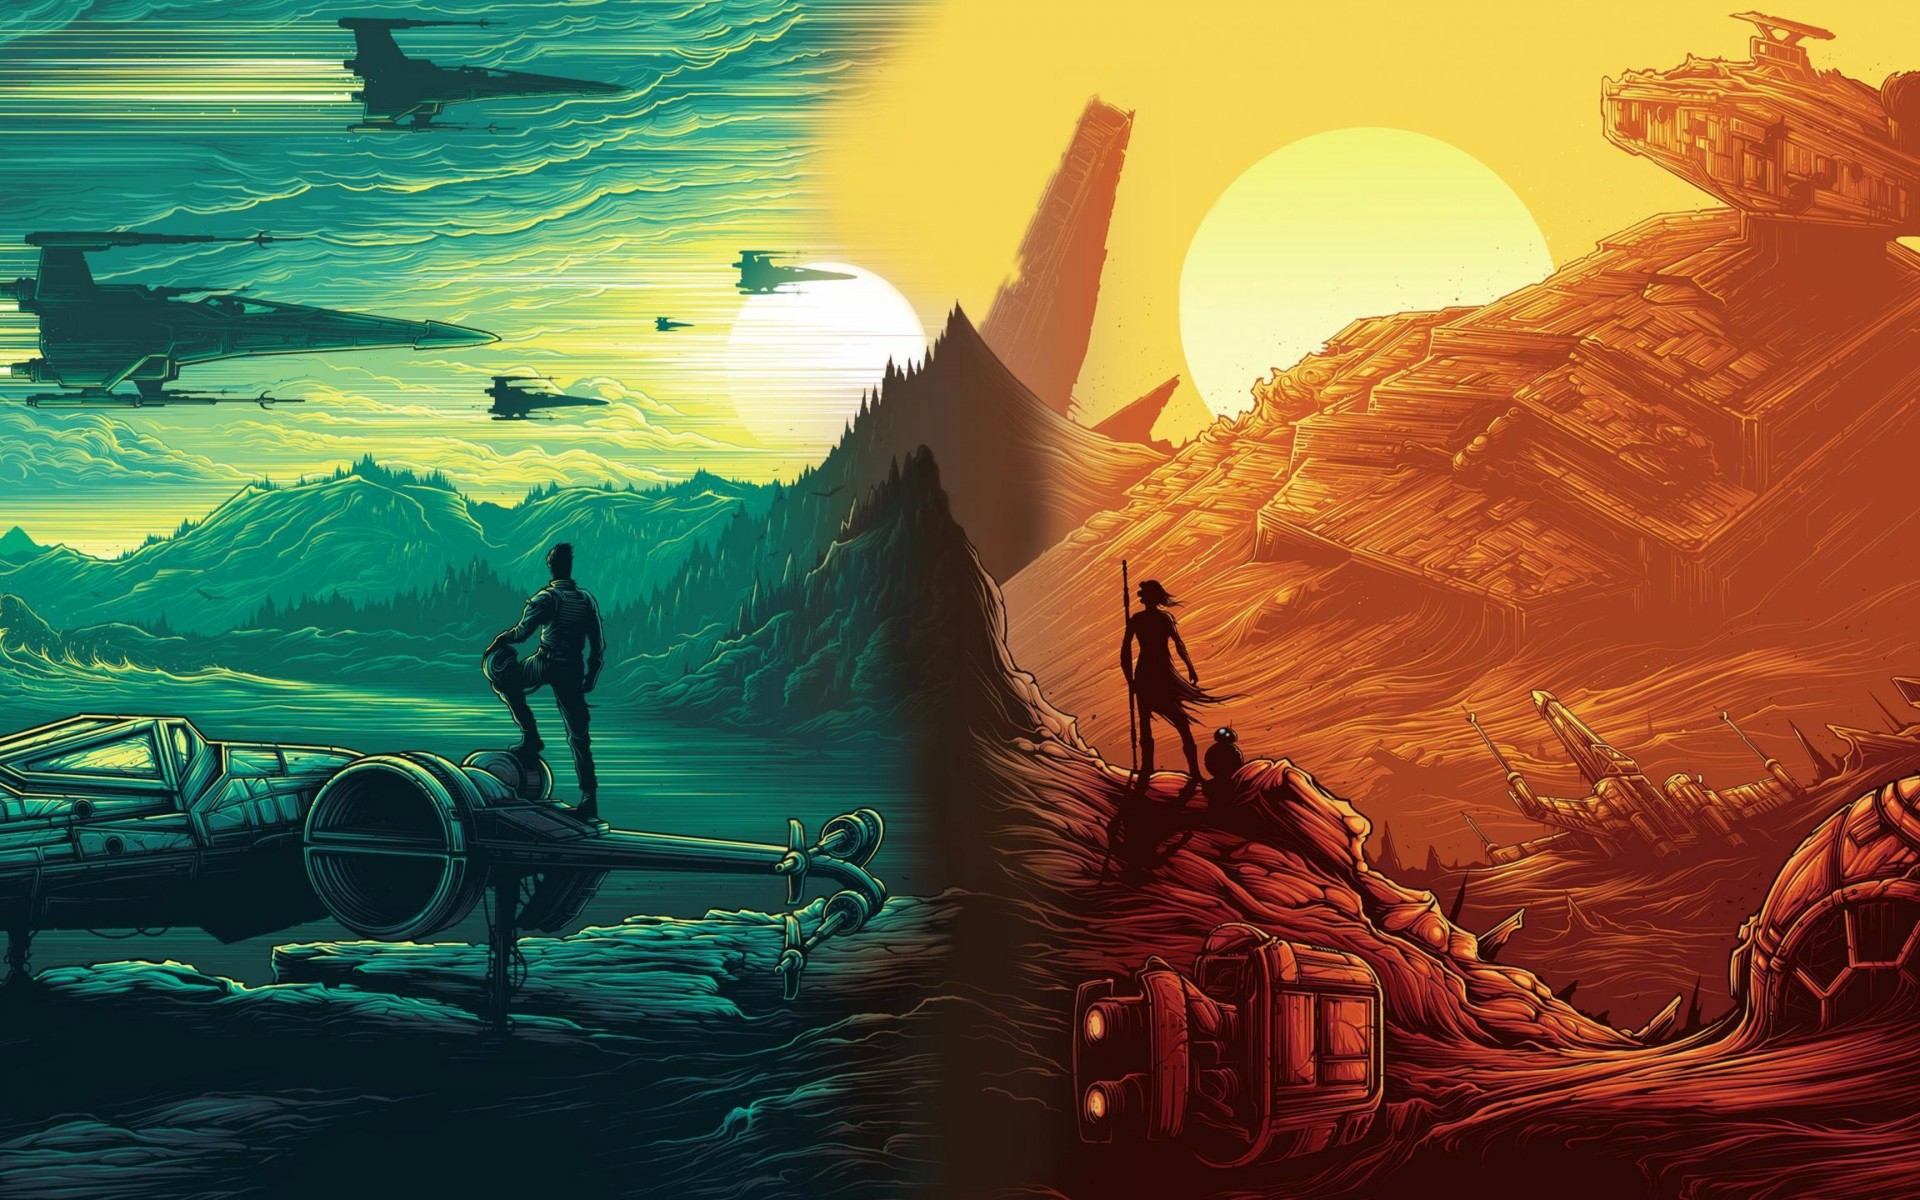 Star Wars Cartoon Wallpaper Sf Wallpaper